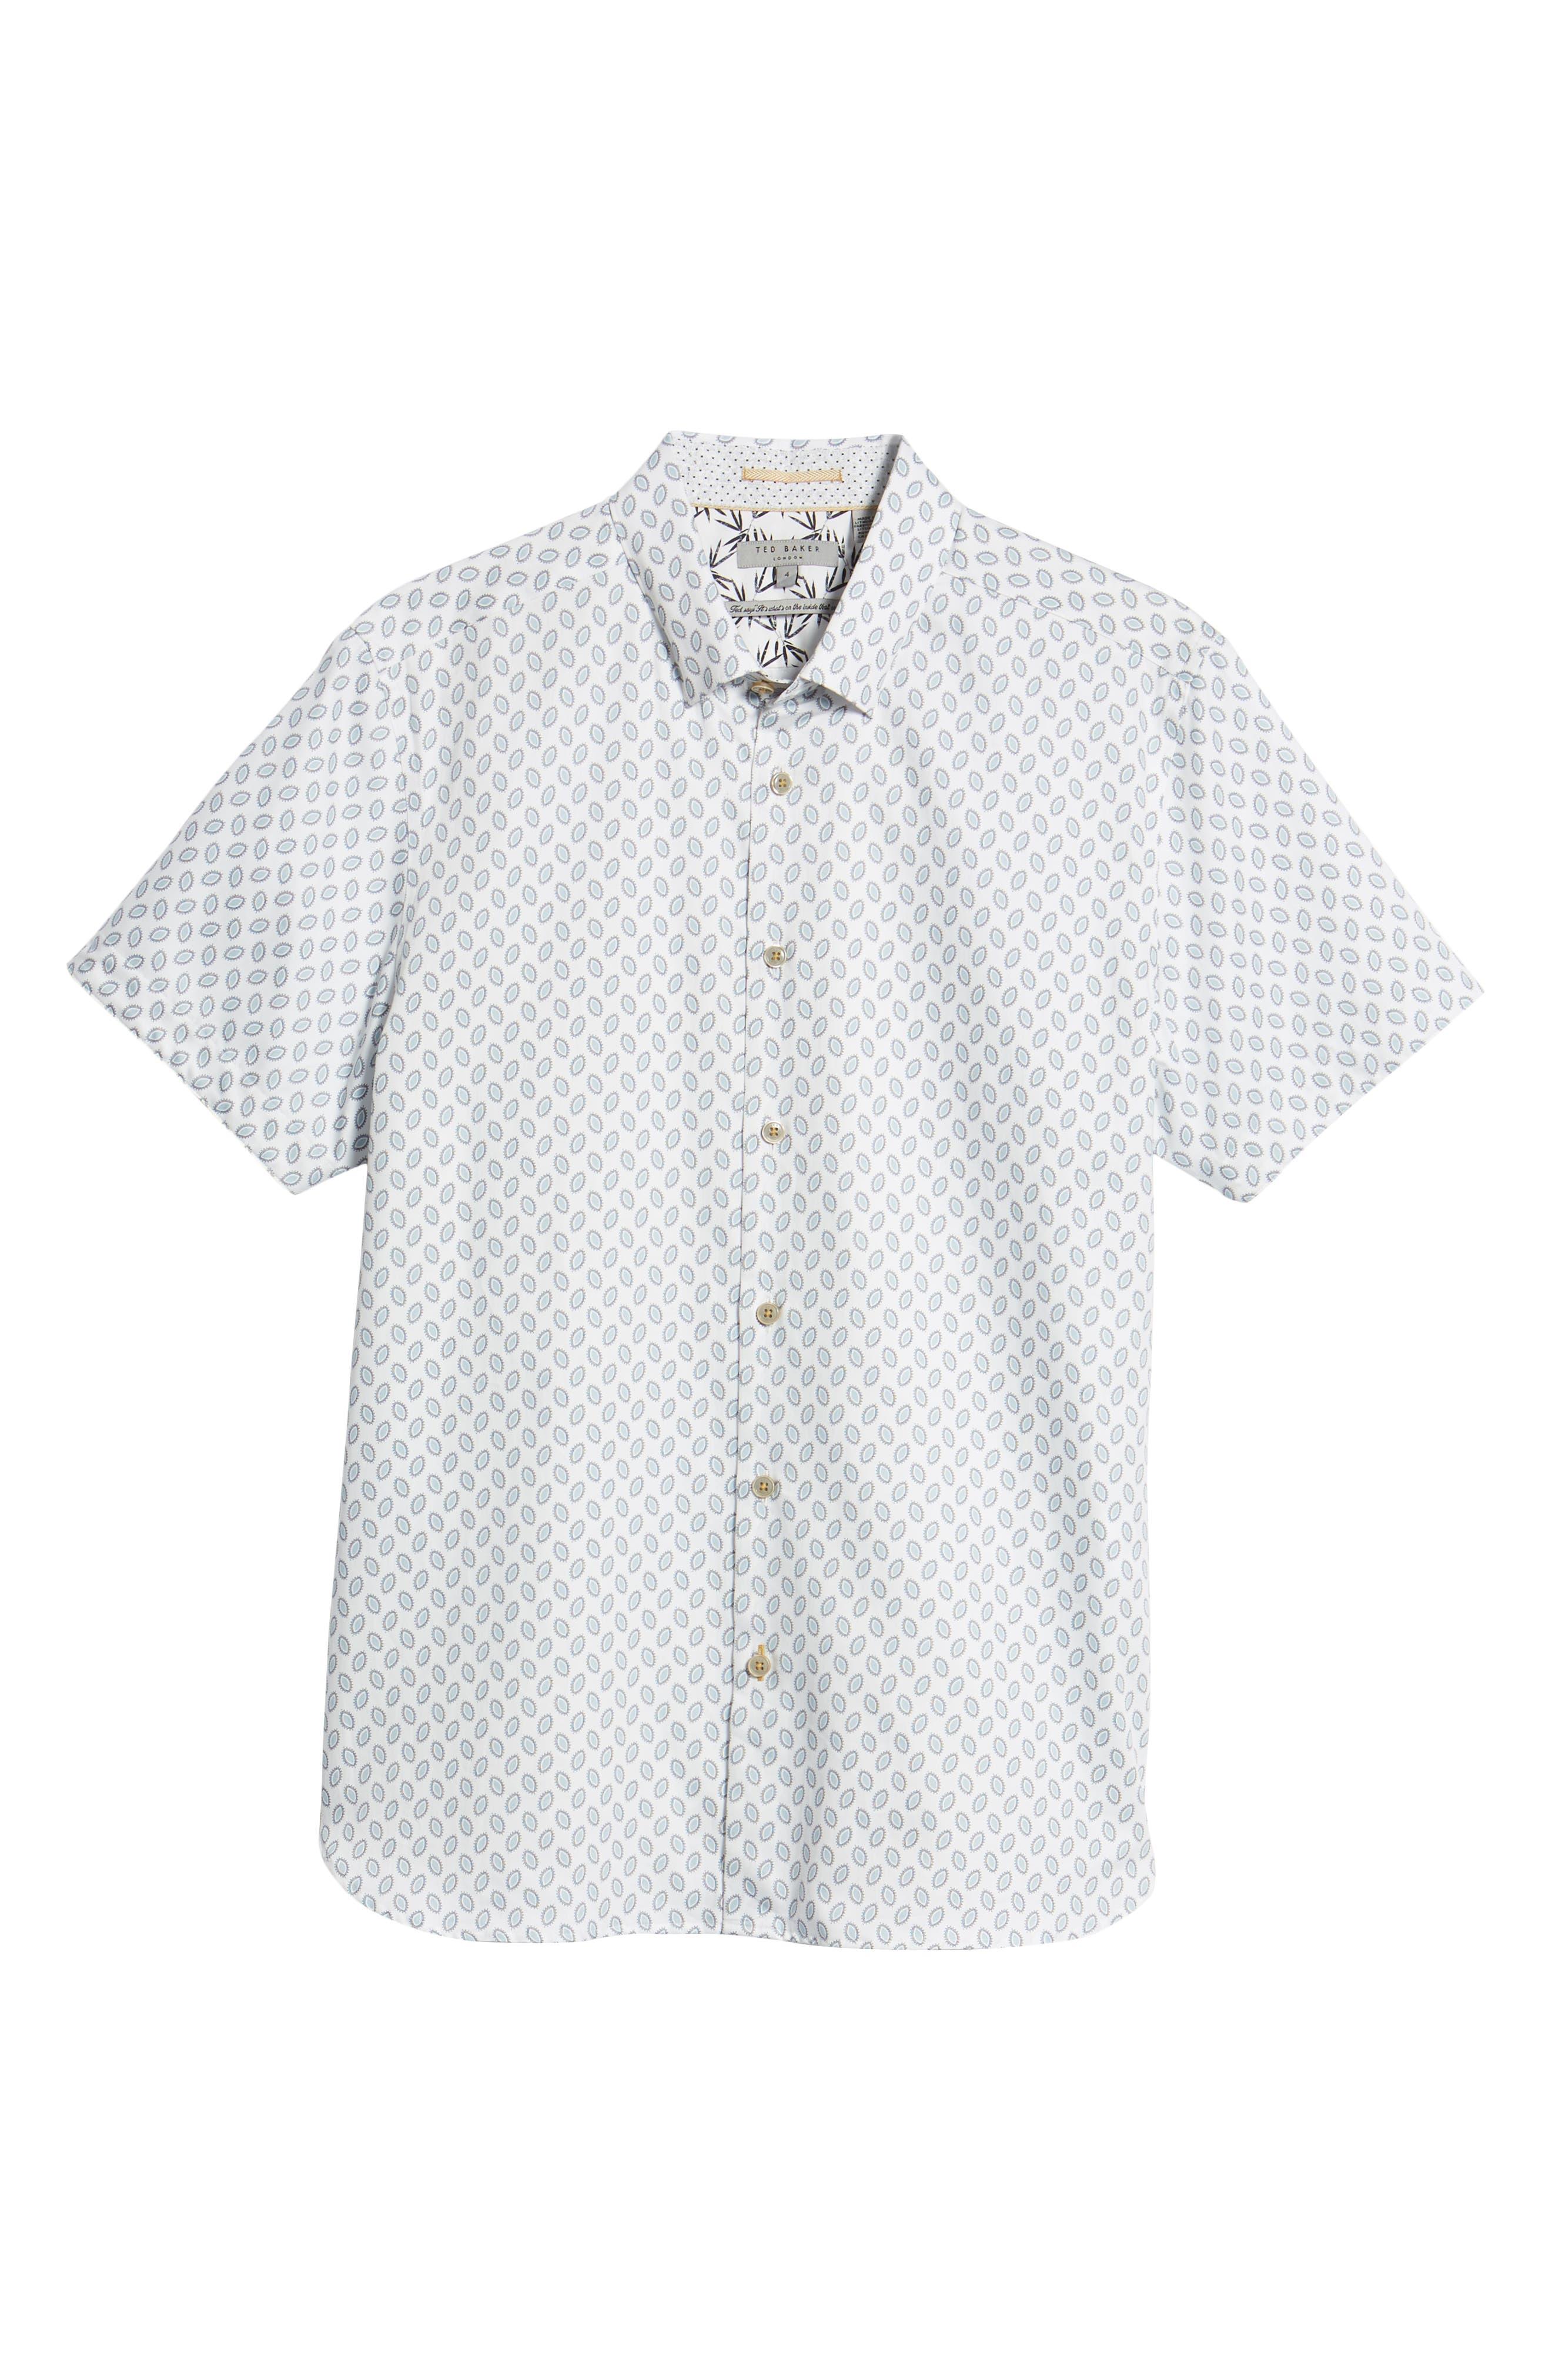 Newfone Trim Fit Chambray Sport Shirt,                             Alternate thumbnail 6, color,                             100